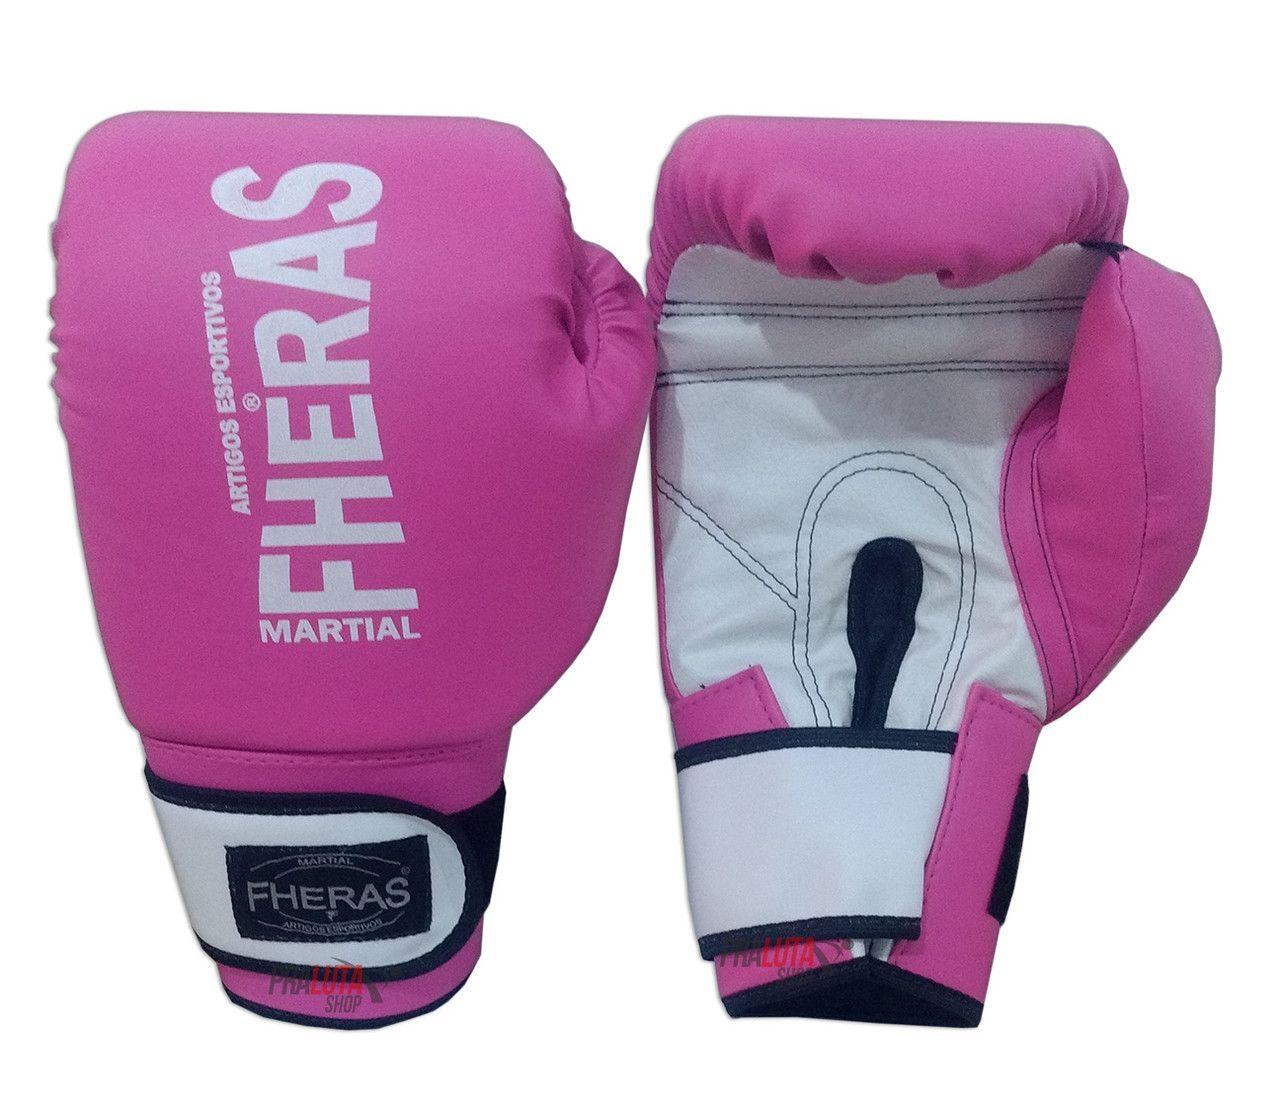 Kit de Boxe / Muay Thai Feminino 14oz - Rosa com branco - Fheras  - PRALUTA SHOP